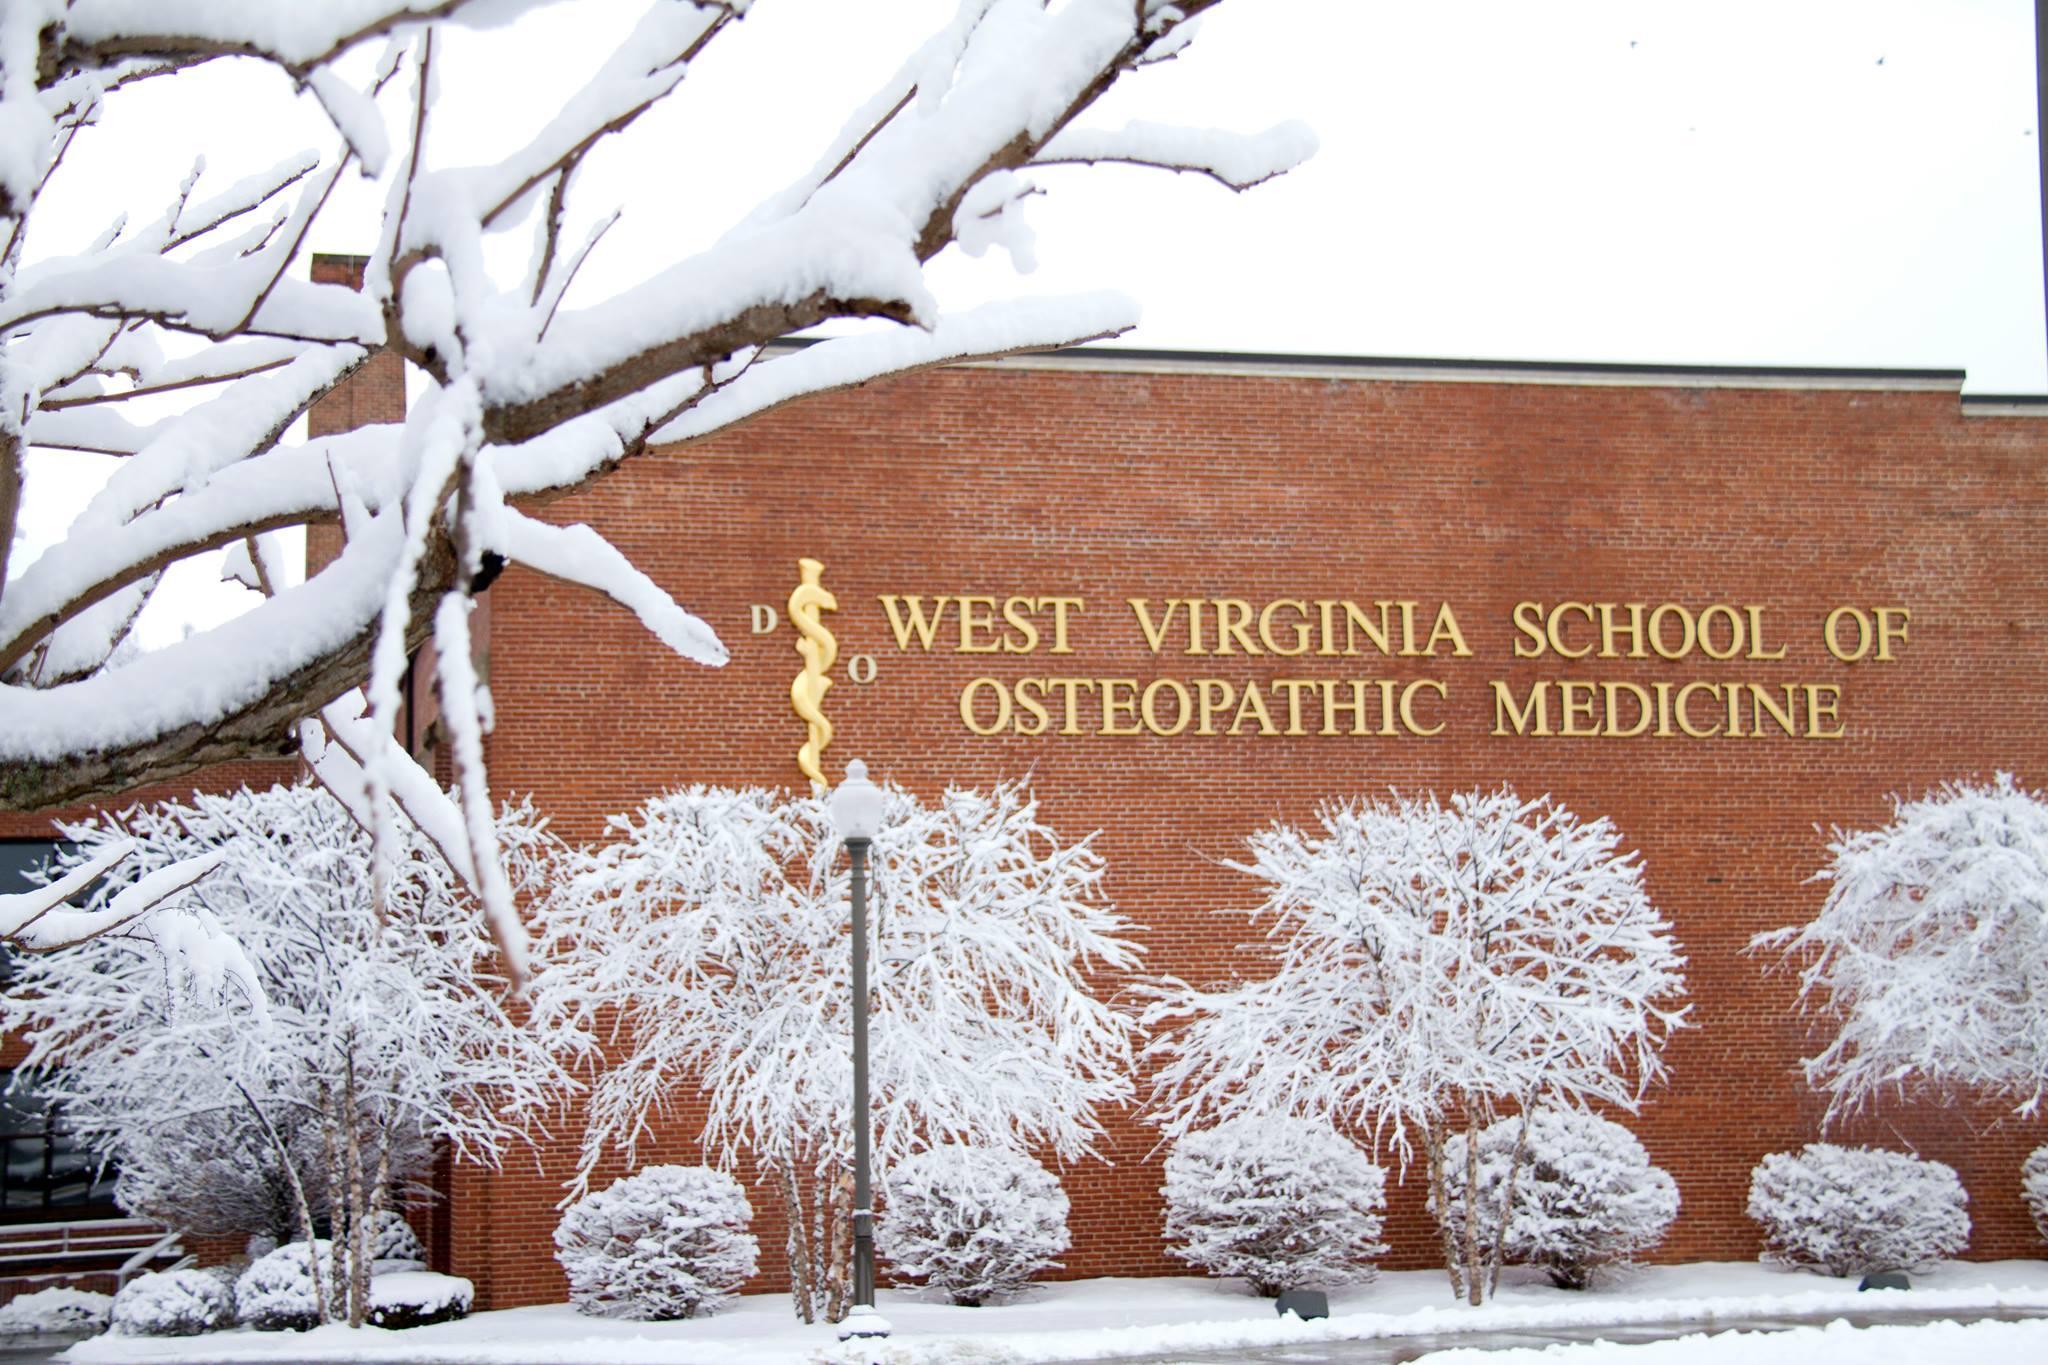 West Virginia School of Osteopathic Medicine image 0